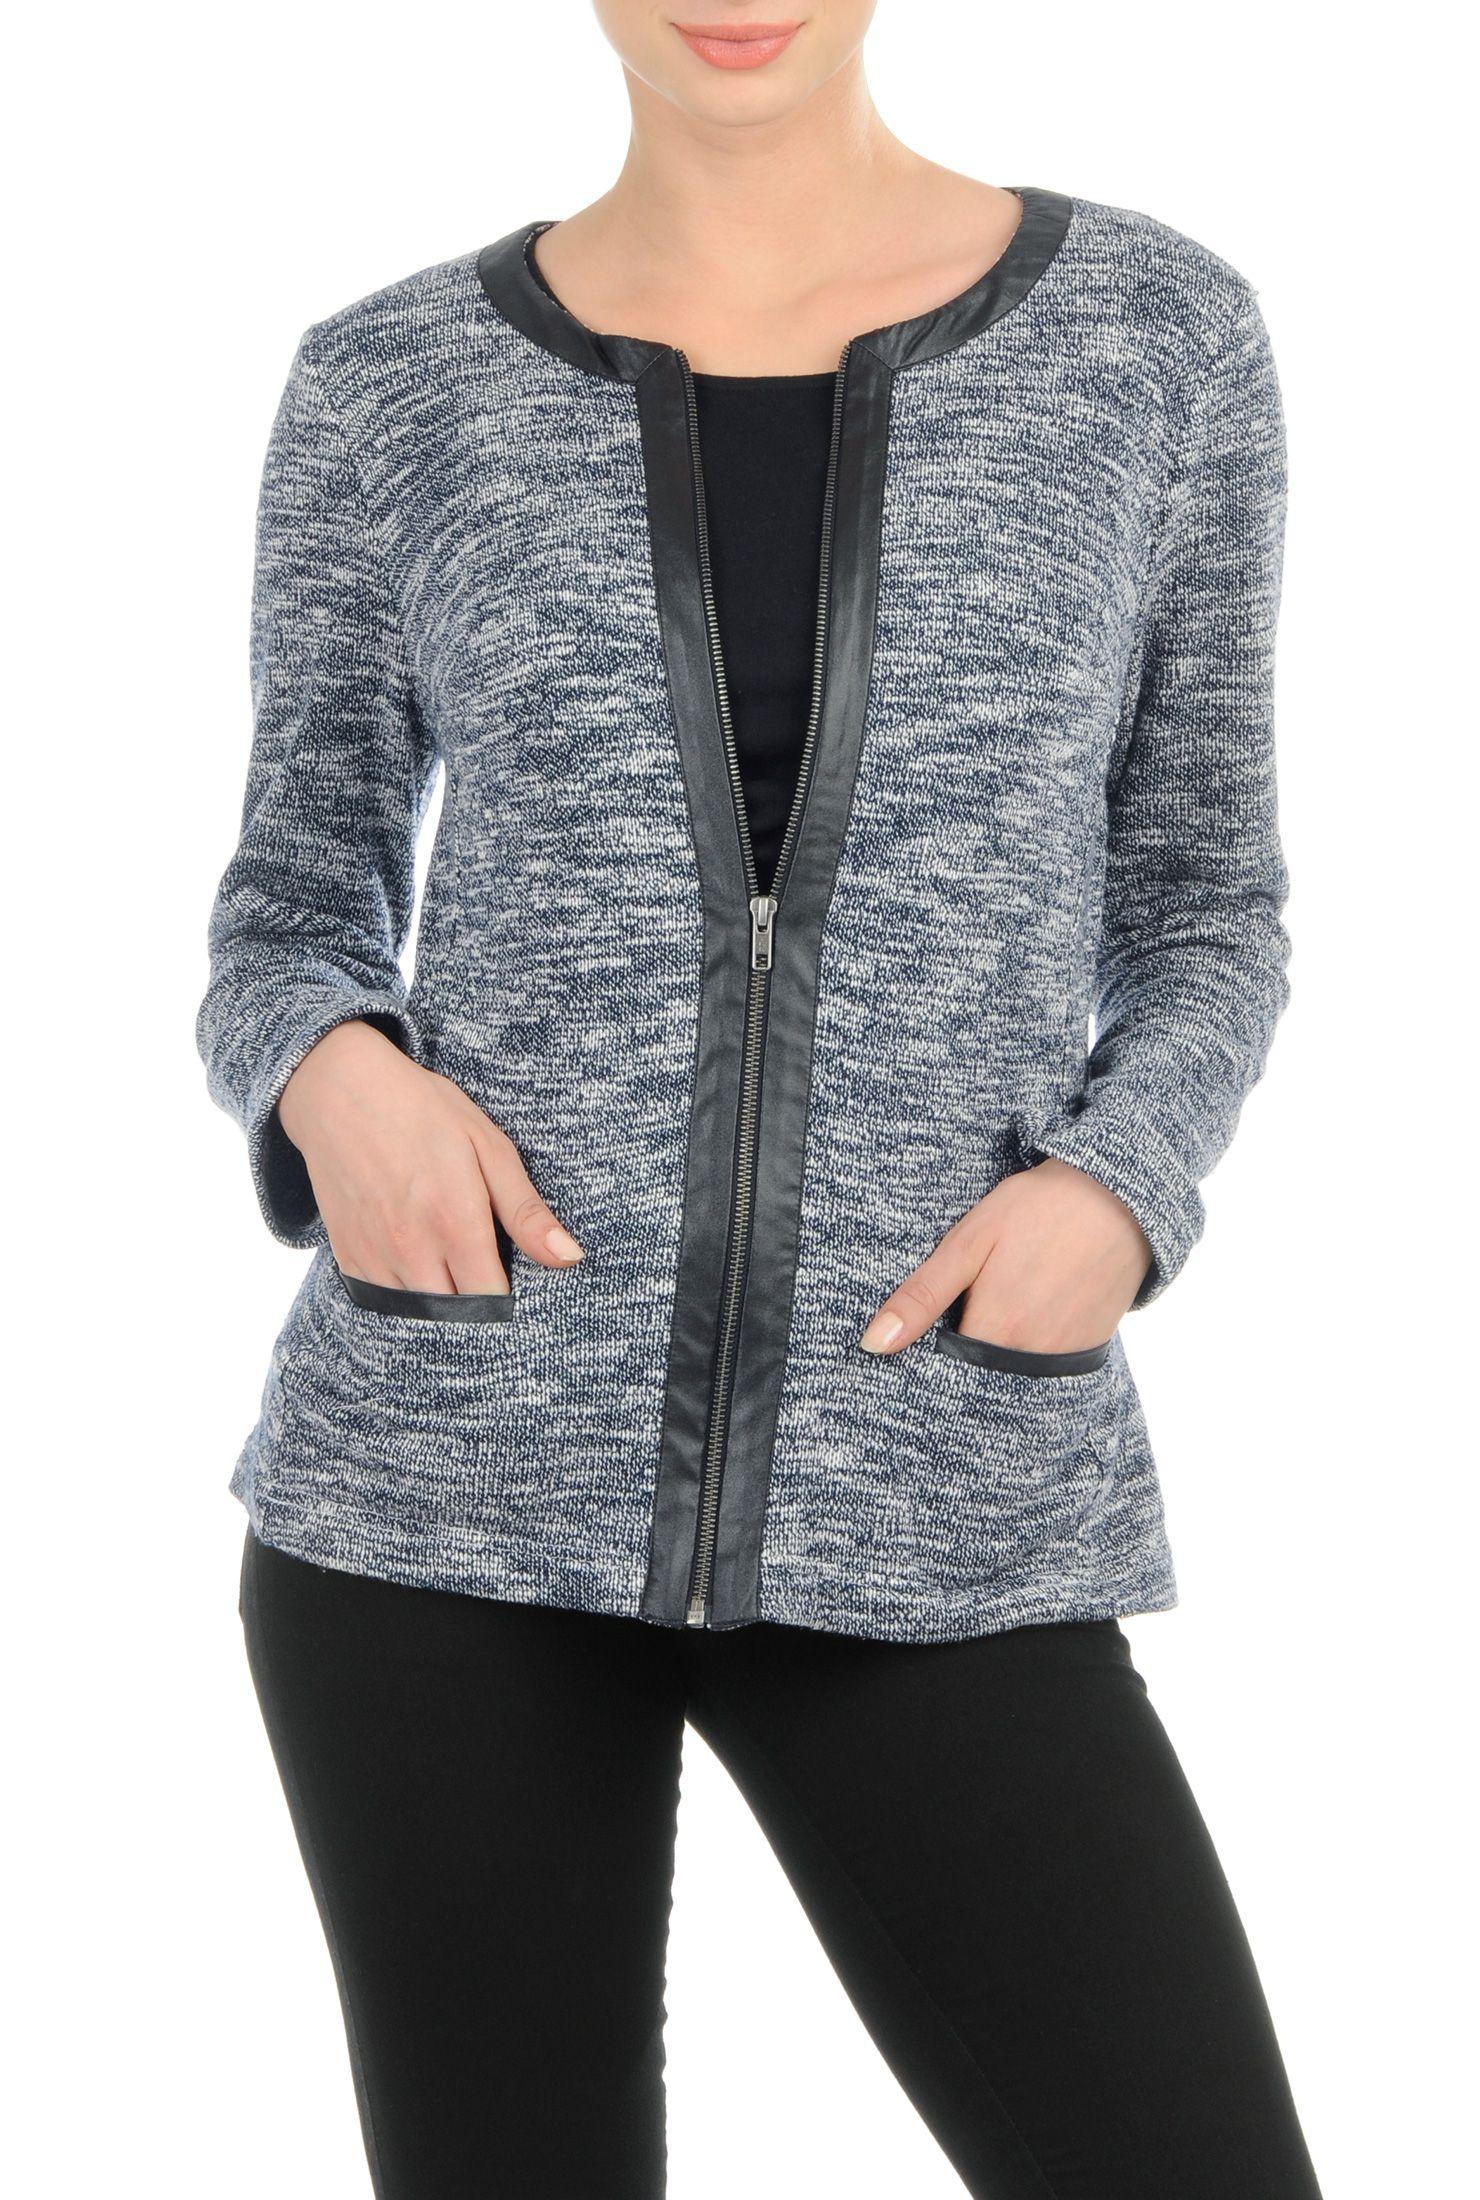 , blue jackets, Cotton/acrylic jackets, deep navy jackets